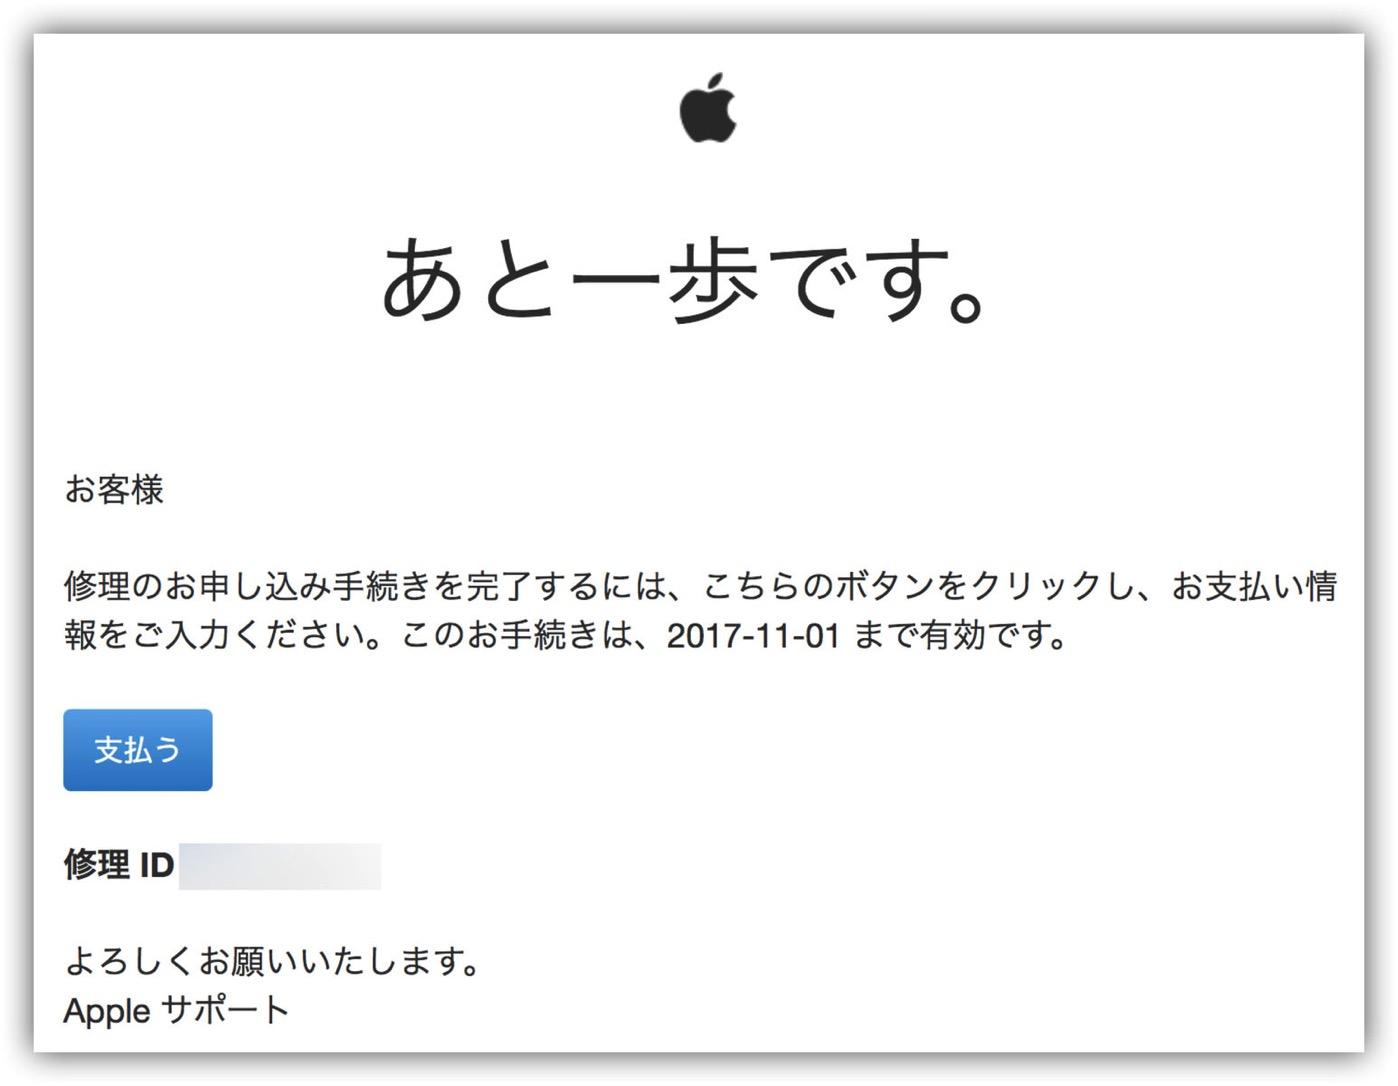 iPhoneエクスプレス交換サービス-1